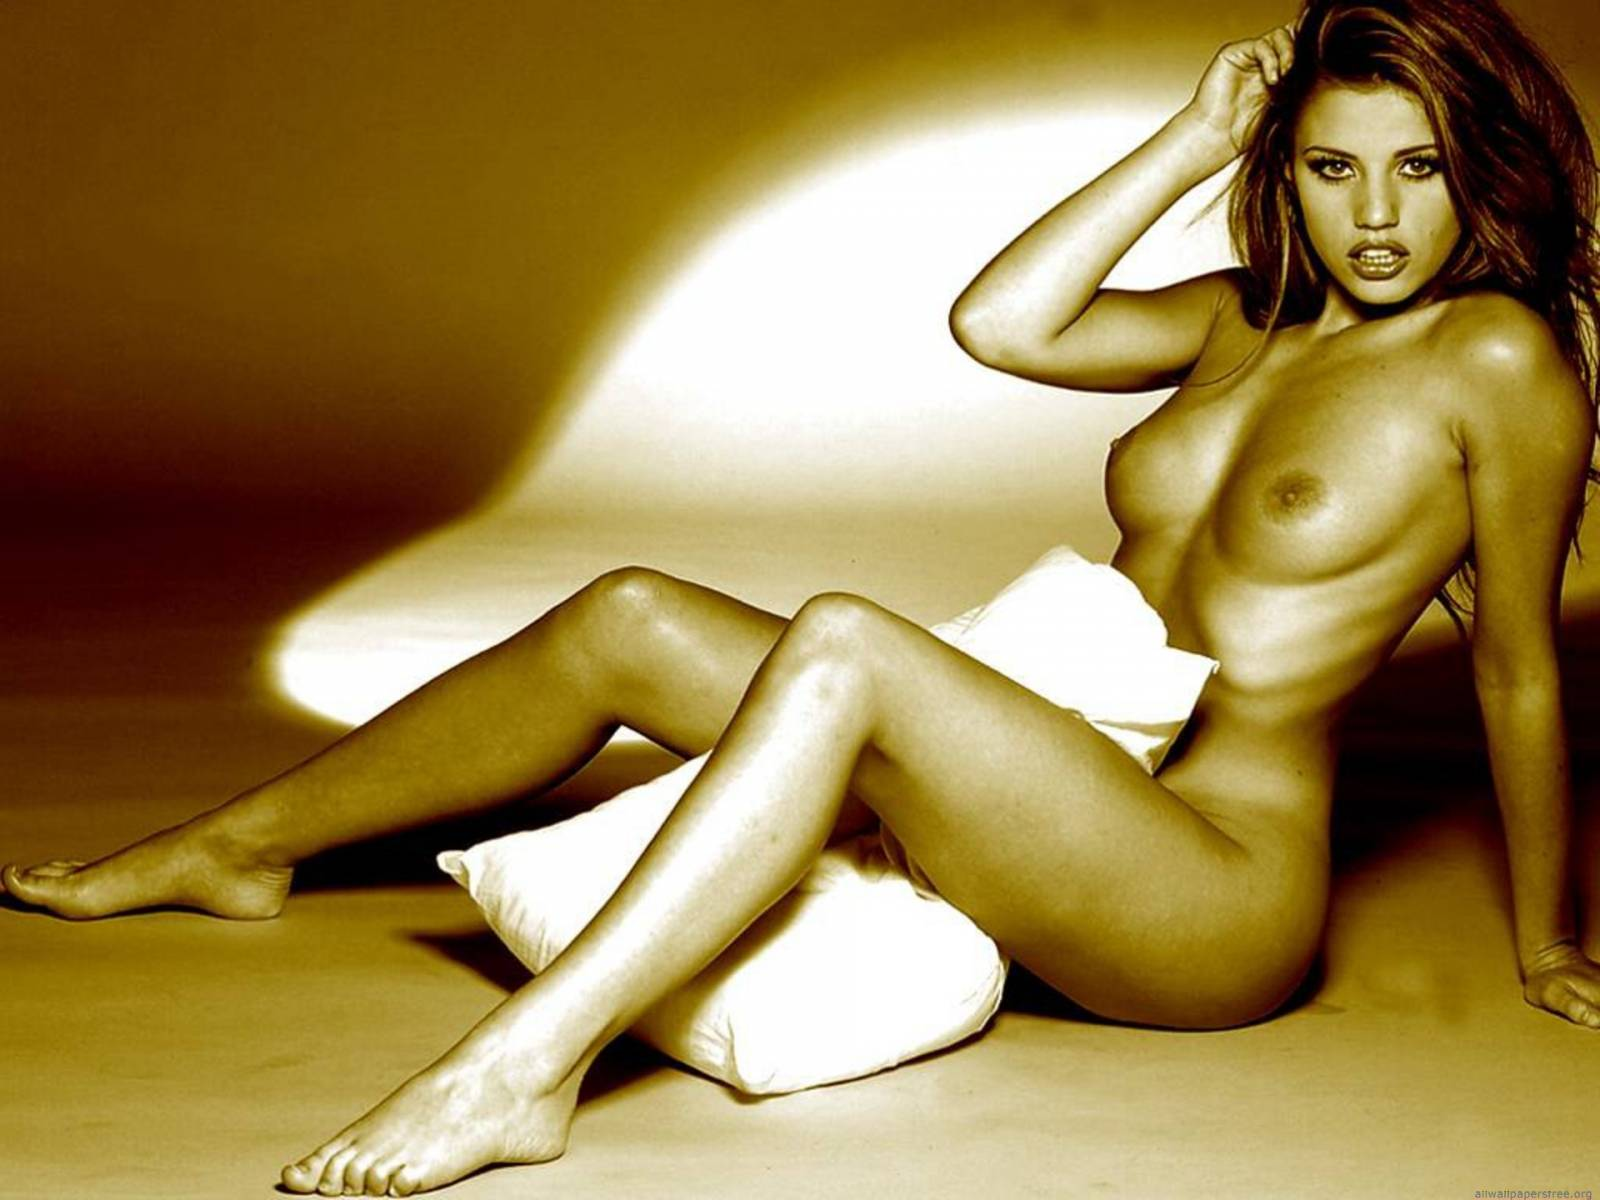 Nude female celebrities wallpapers hentai movies